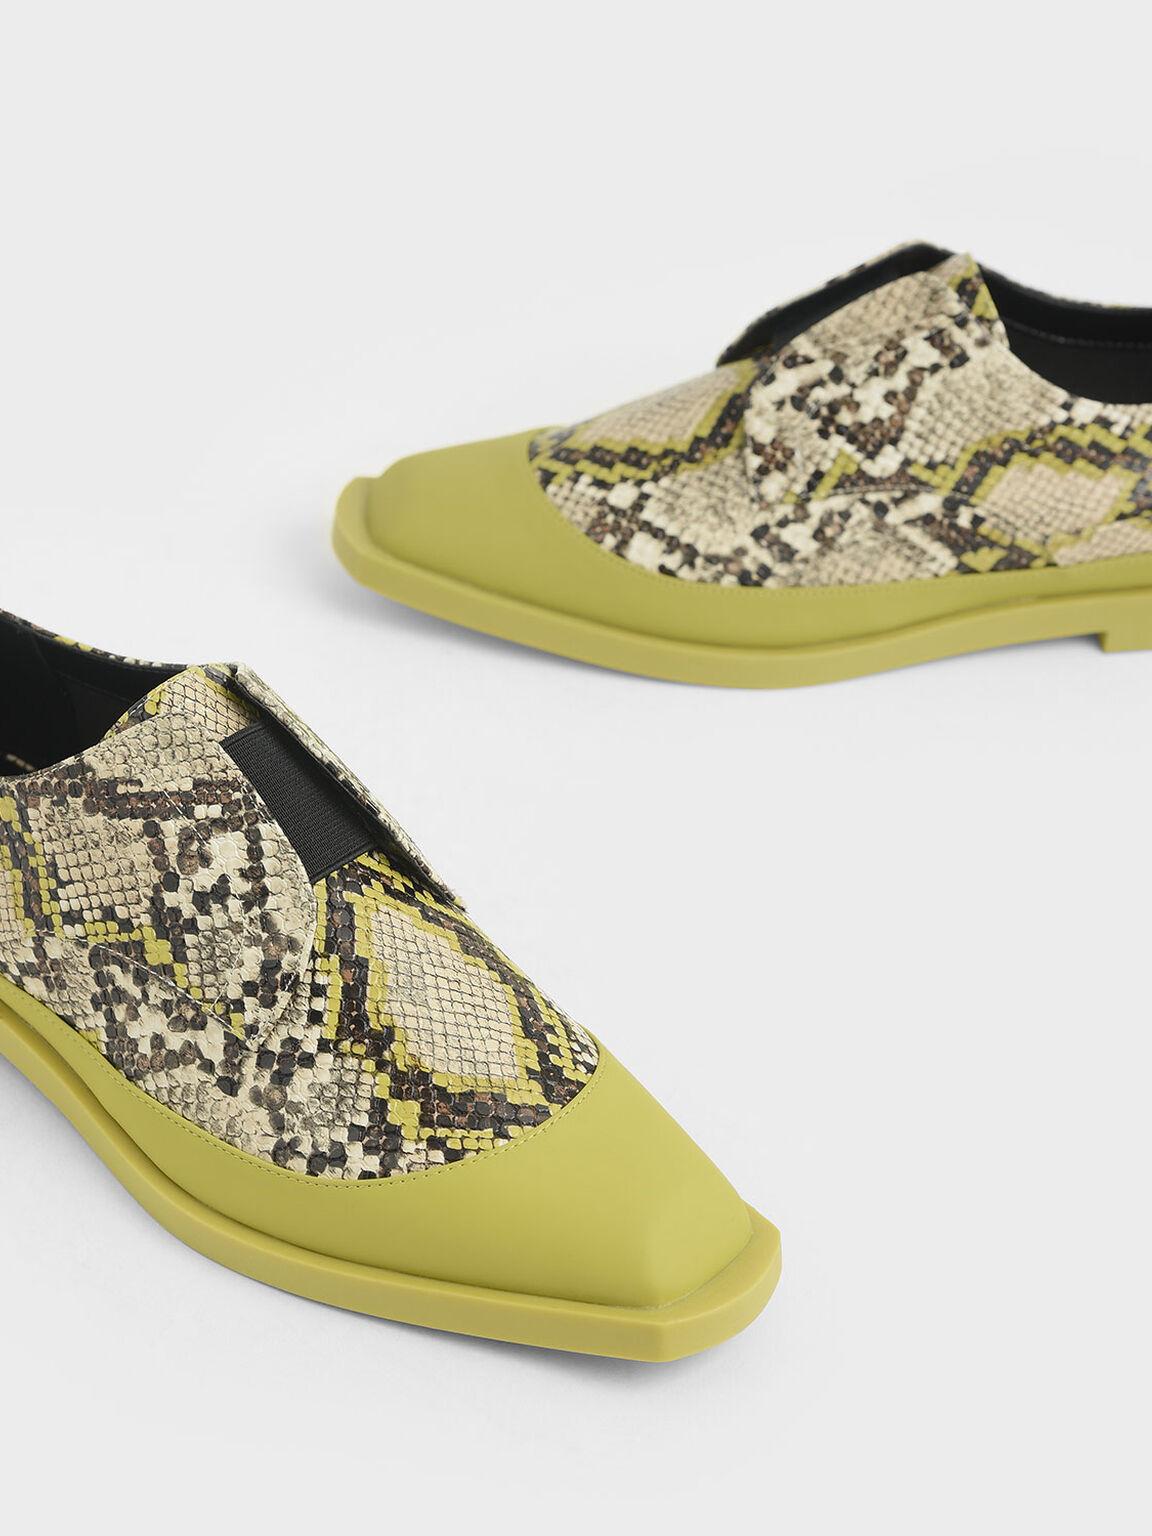 Snake Print Loafers, Multi, hi-res